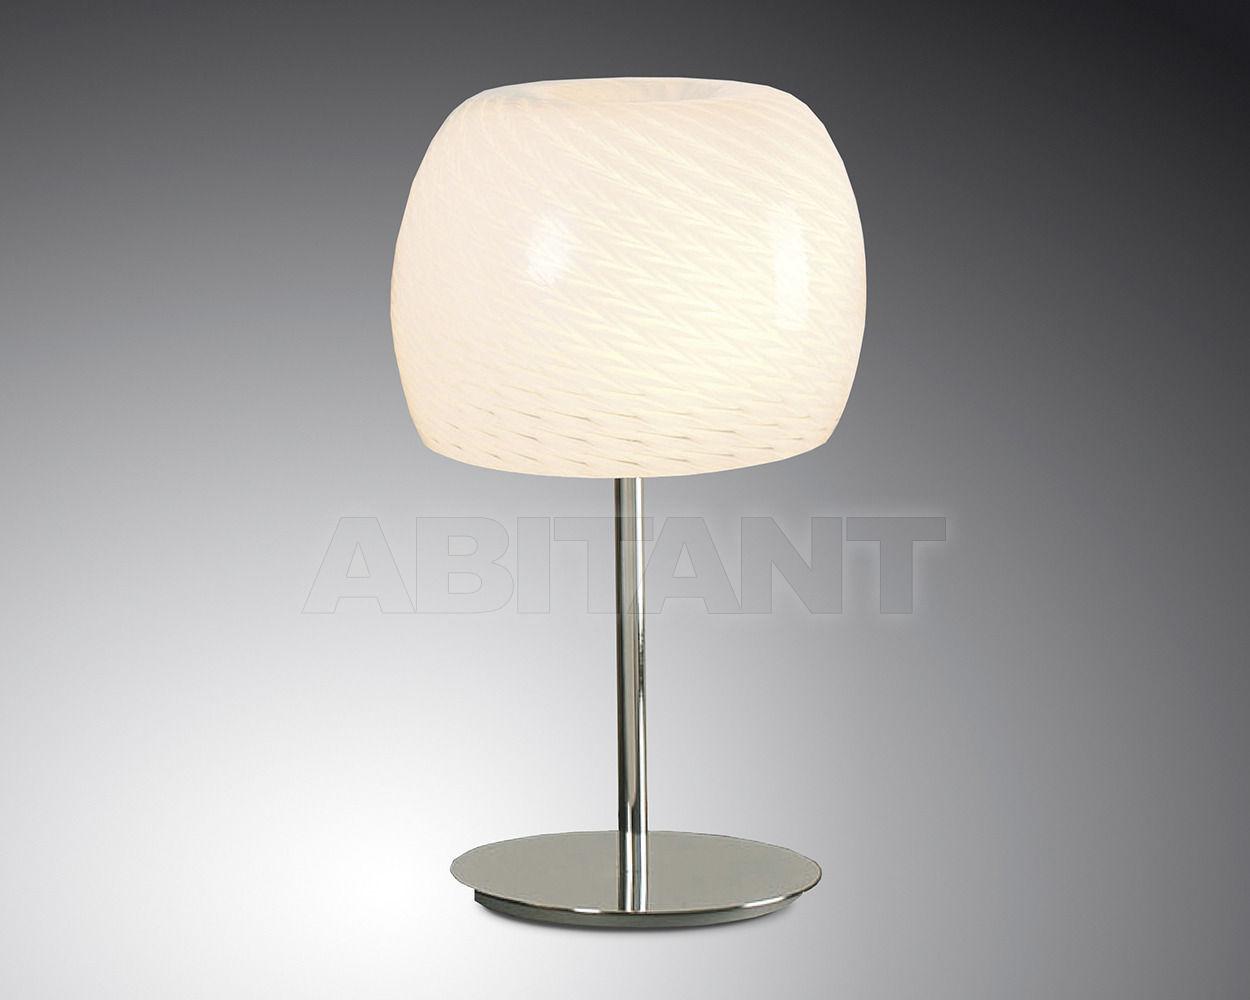 Купить Лампа настольная Linea Verdace 2012 LV 72006/CH